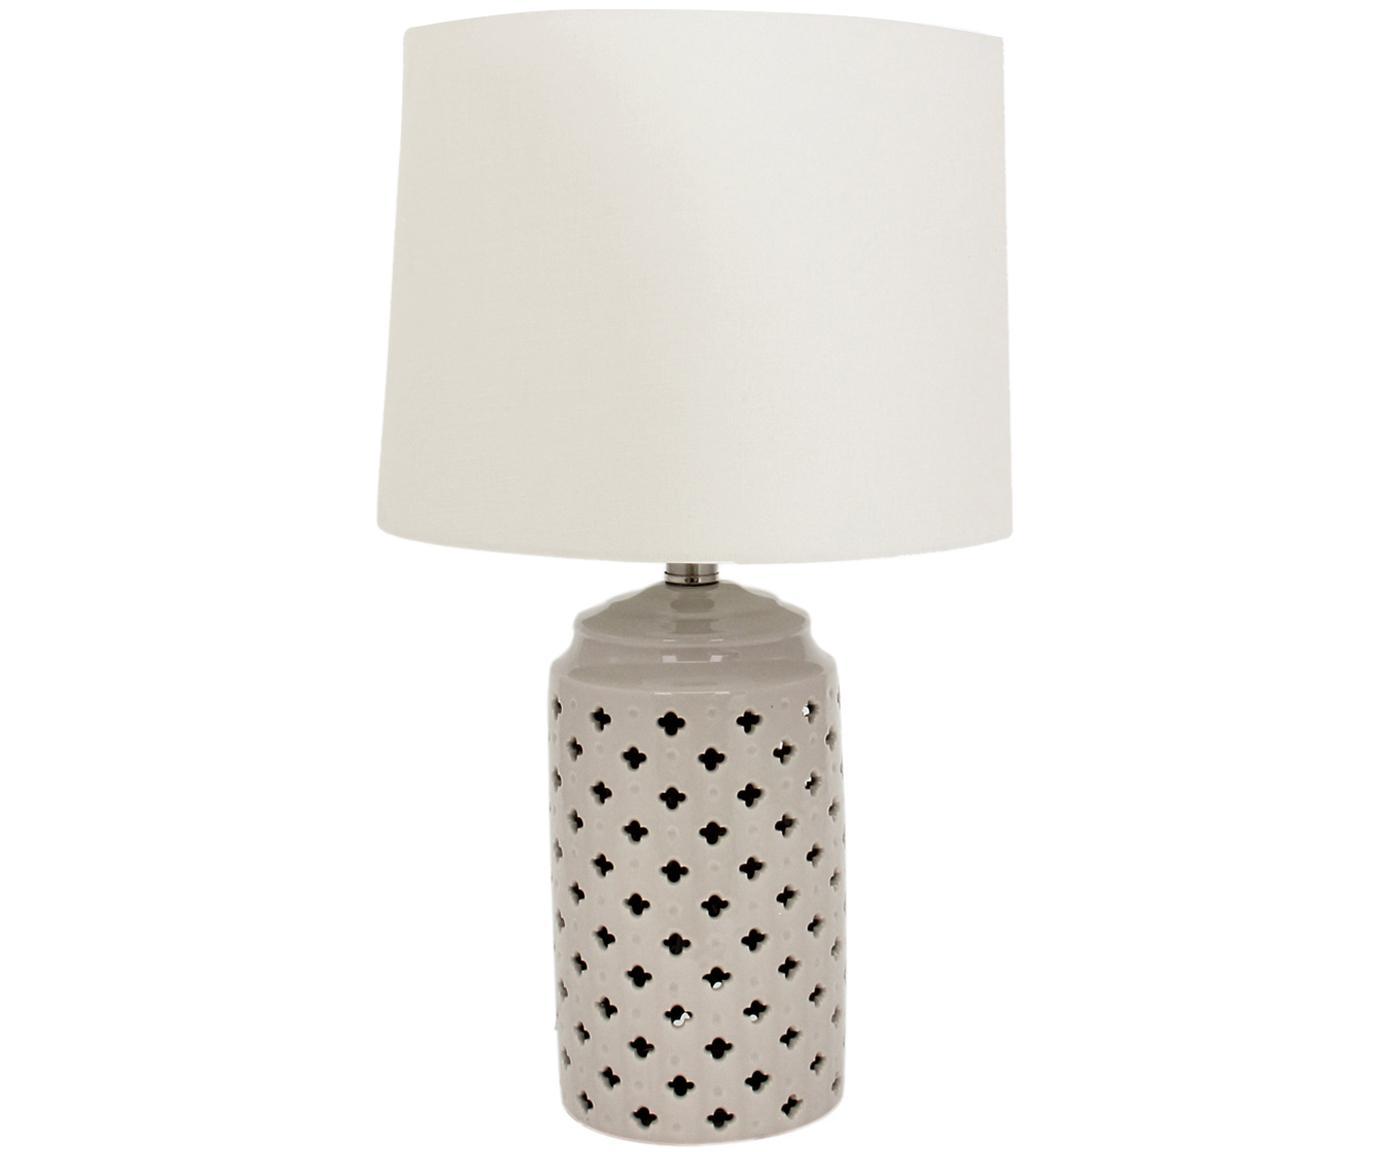 Keramische tafellamp Naomi, Lampenkap: textiel, Lampvoet: keramiek, Wit, taupe, Ø 28 cm